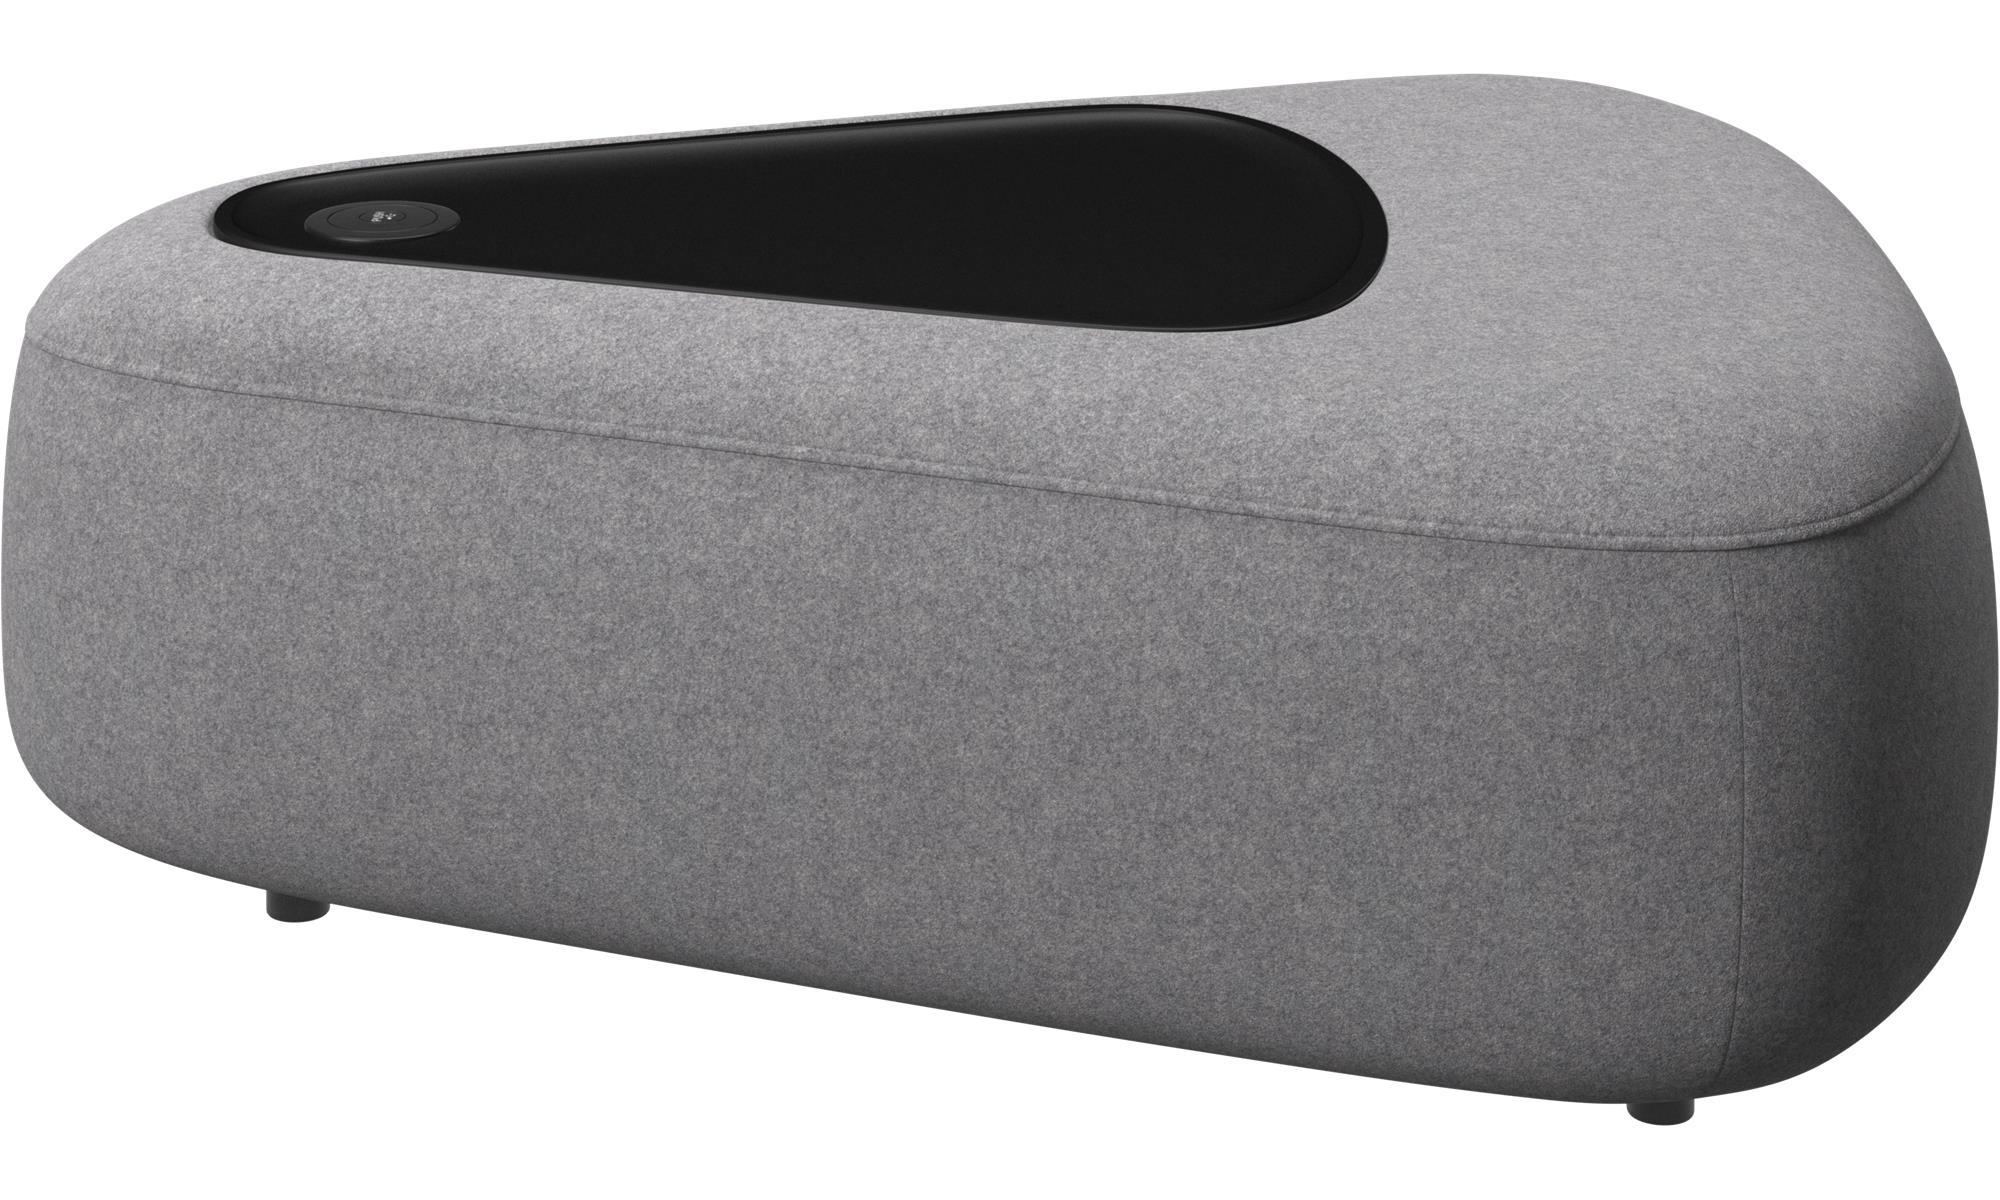 modulare sofas ottawa dreieckiger pouf mit ablage und usb ladekabel boconcept. Black Bedroom Furniture Sets. Home Design Ideas